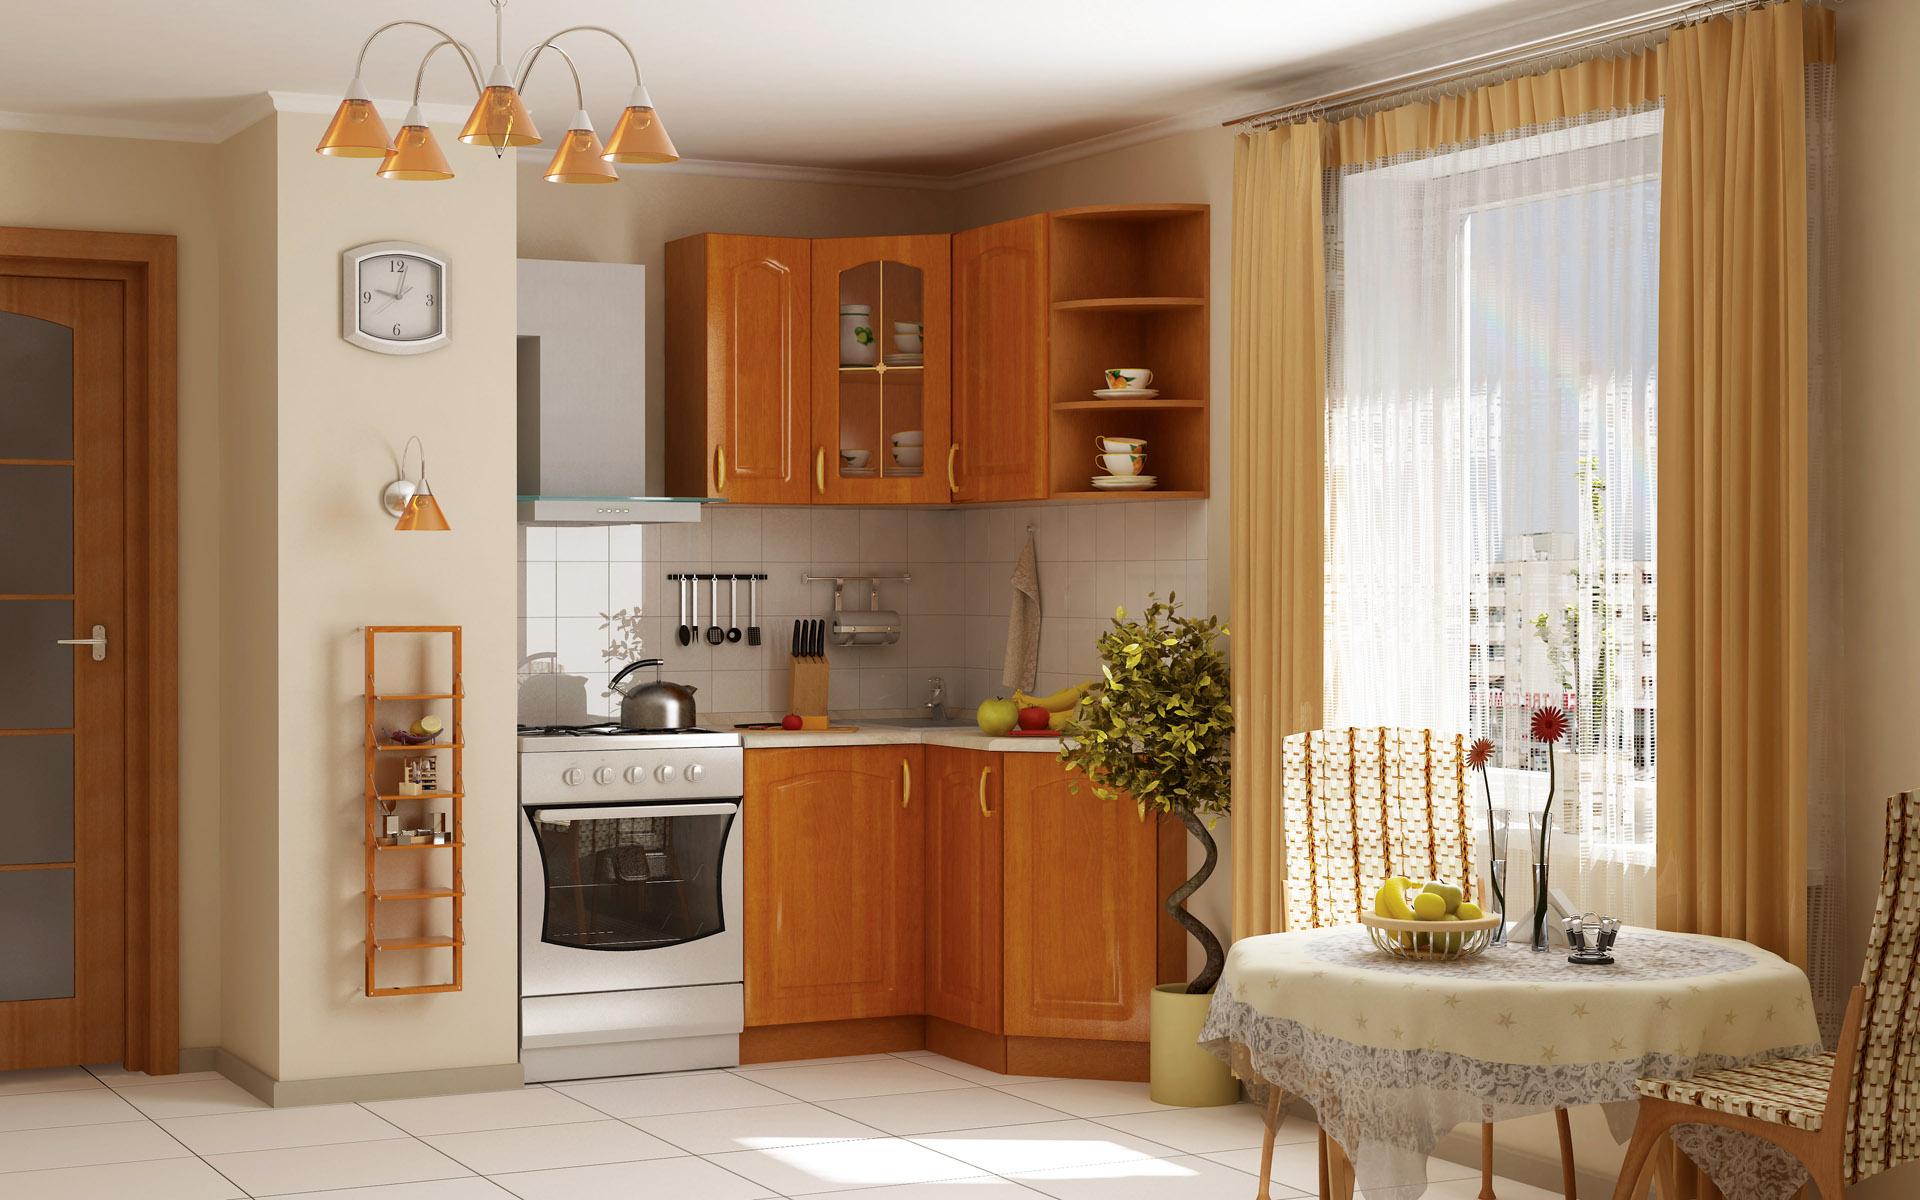 luxurious-kitchen-interior-design-and-lighting luxurious kitchen interior design and lighting